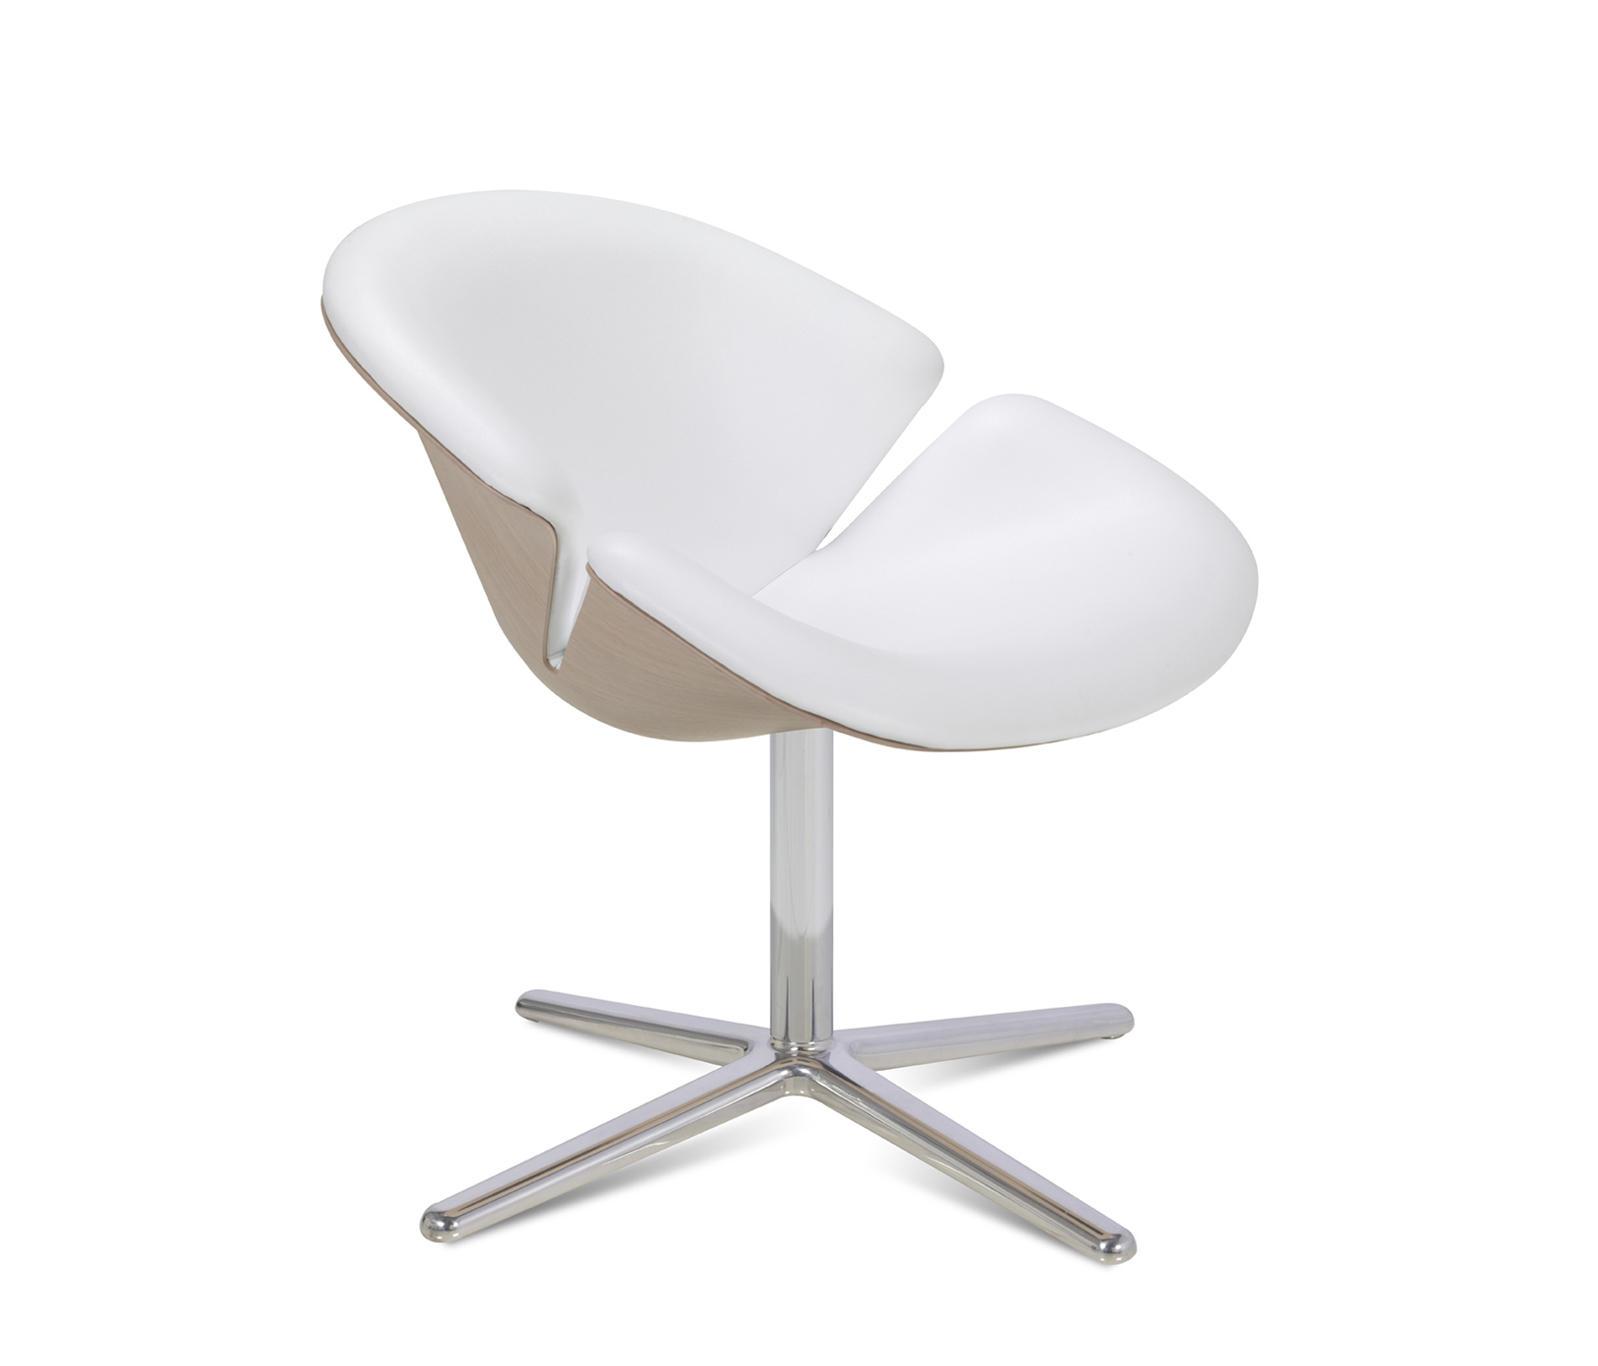 bloom armchair  lounge chairs from jori  architonic -  bloom armchair by jori  lounge chairs